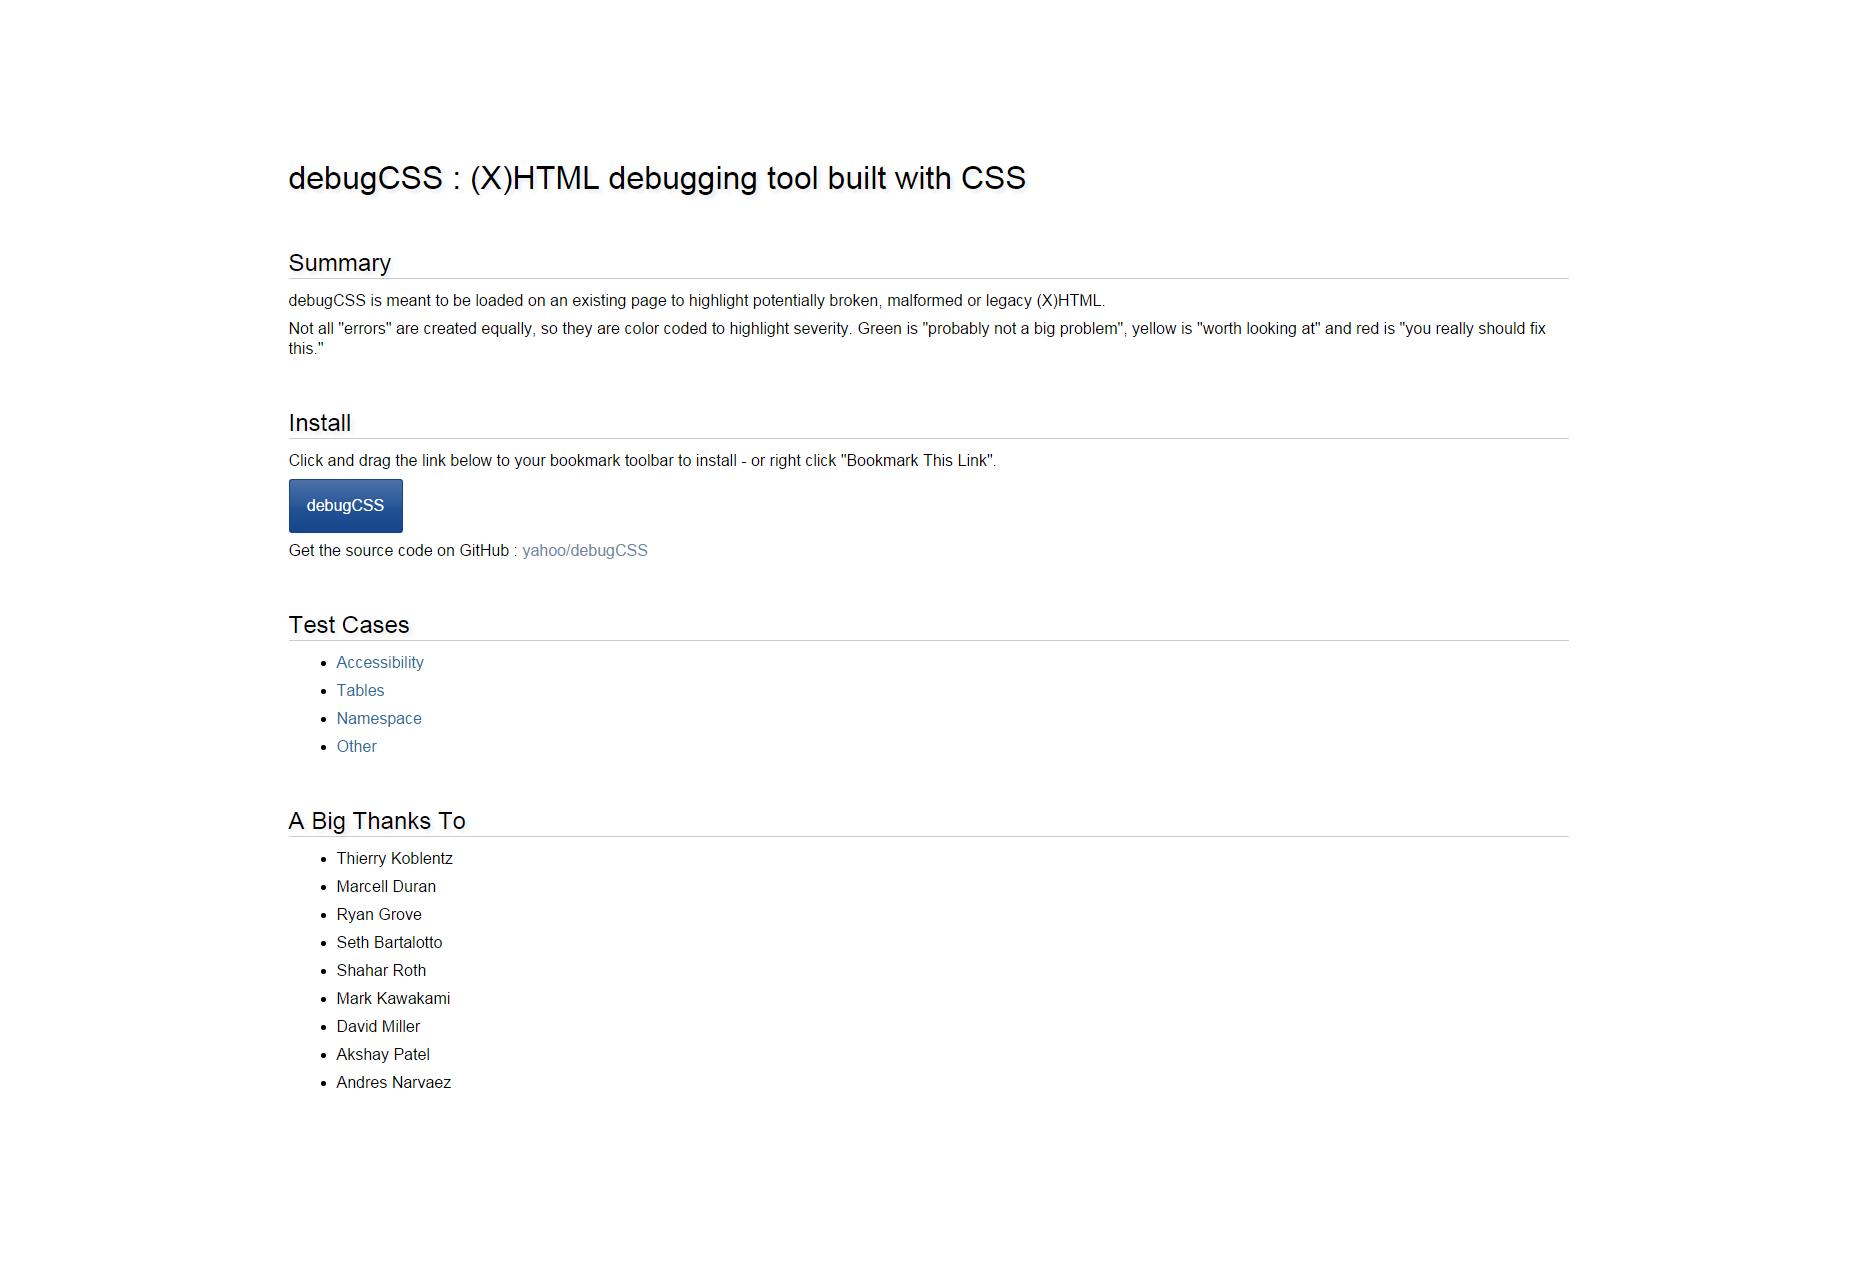 DebugCSS: HTML CSS Debugging Tool Built